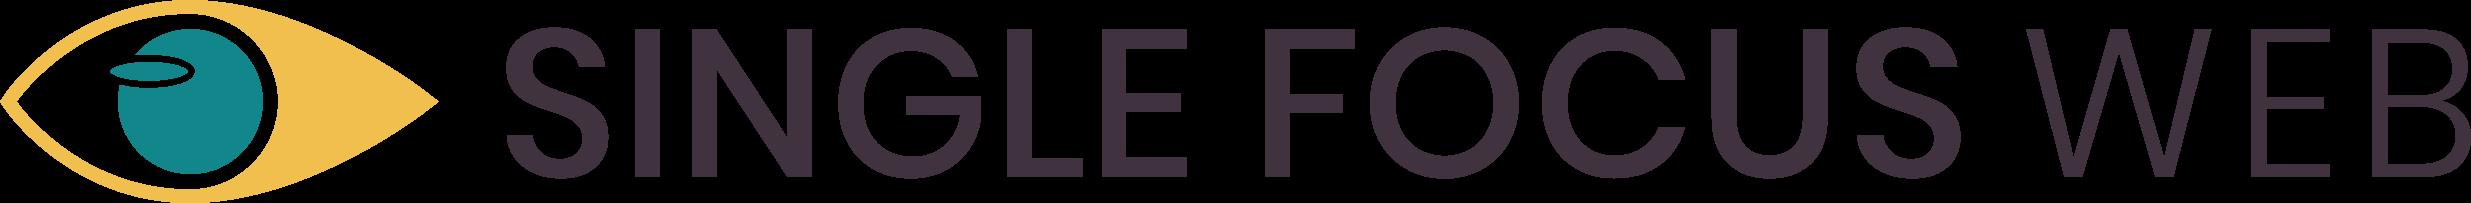 Single Focus Web; Website Design for Nonprofits